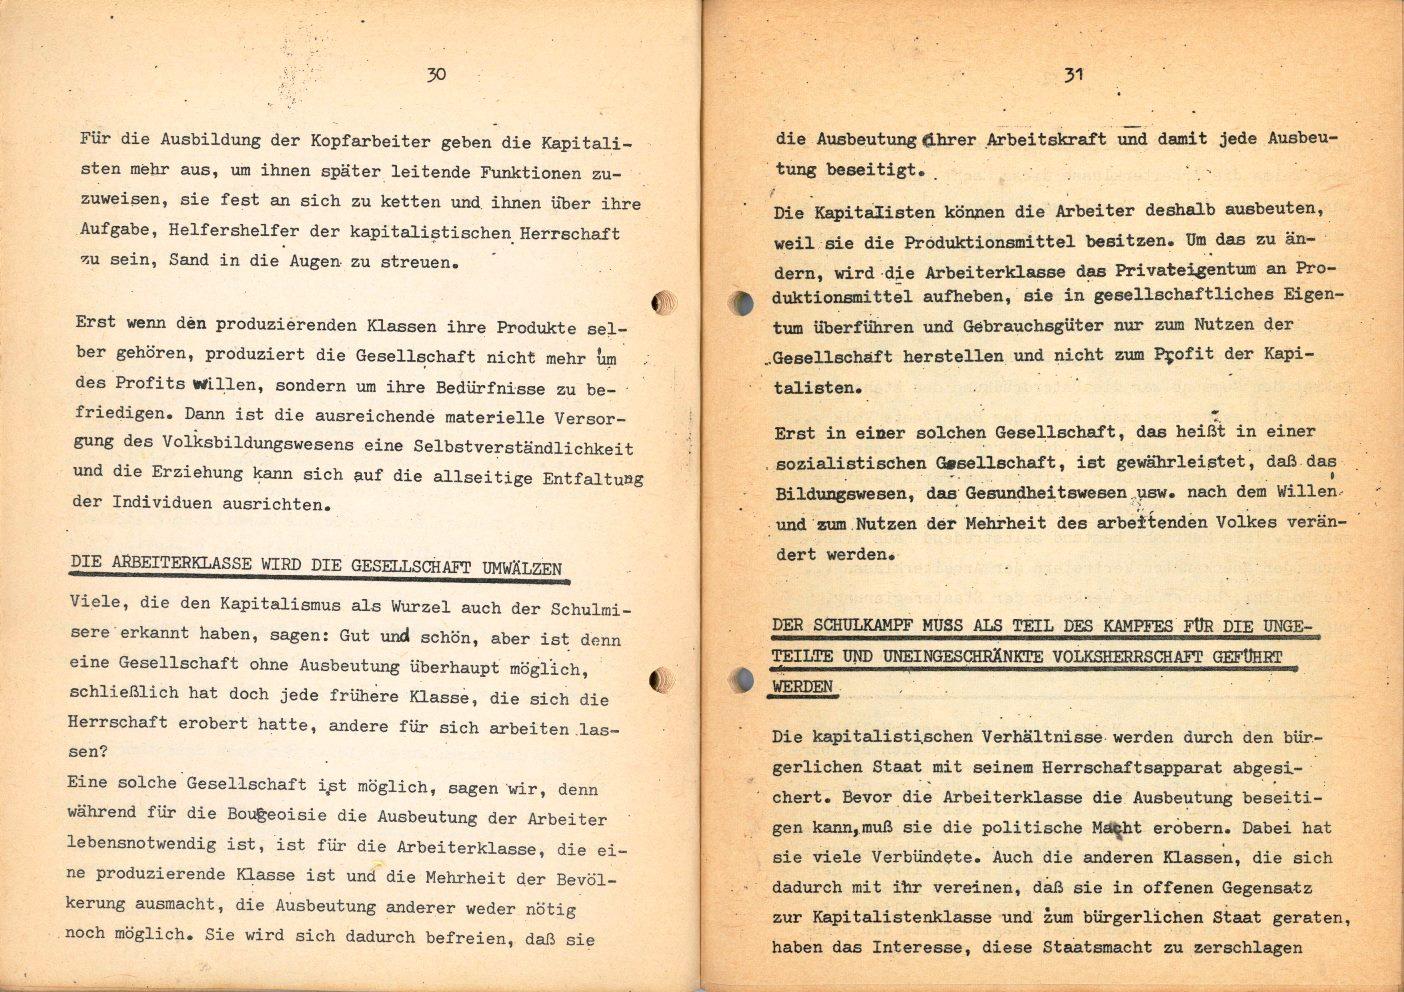 Berlin_SMV_GUV_1974_Schulmisere_18